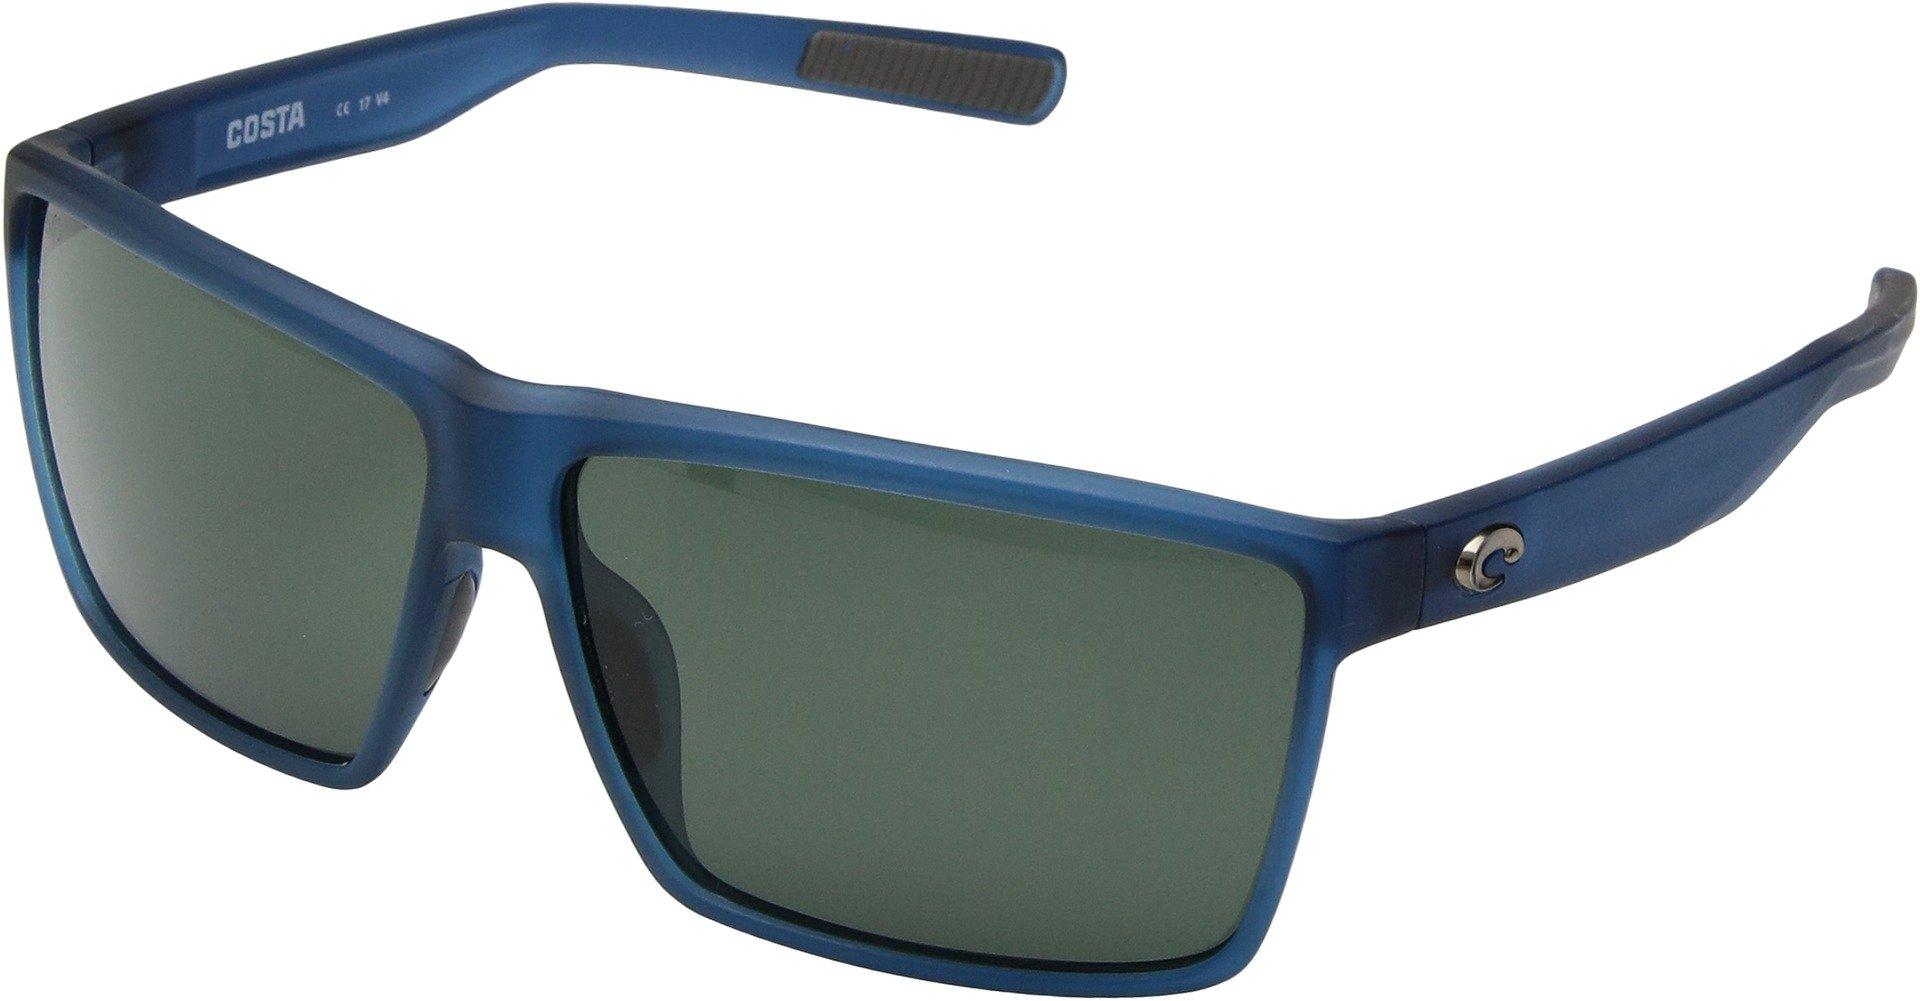 Costa Unisex Rincon Matte Atlantic Blue/Gray 580g One Size